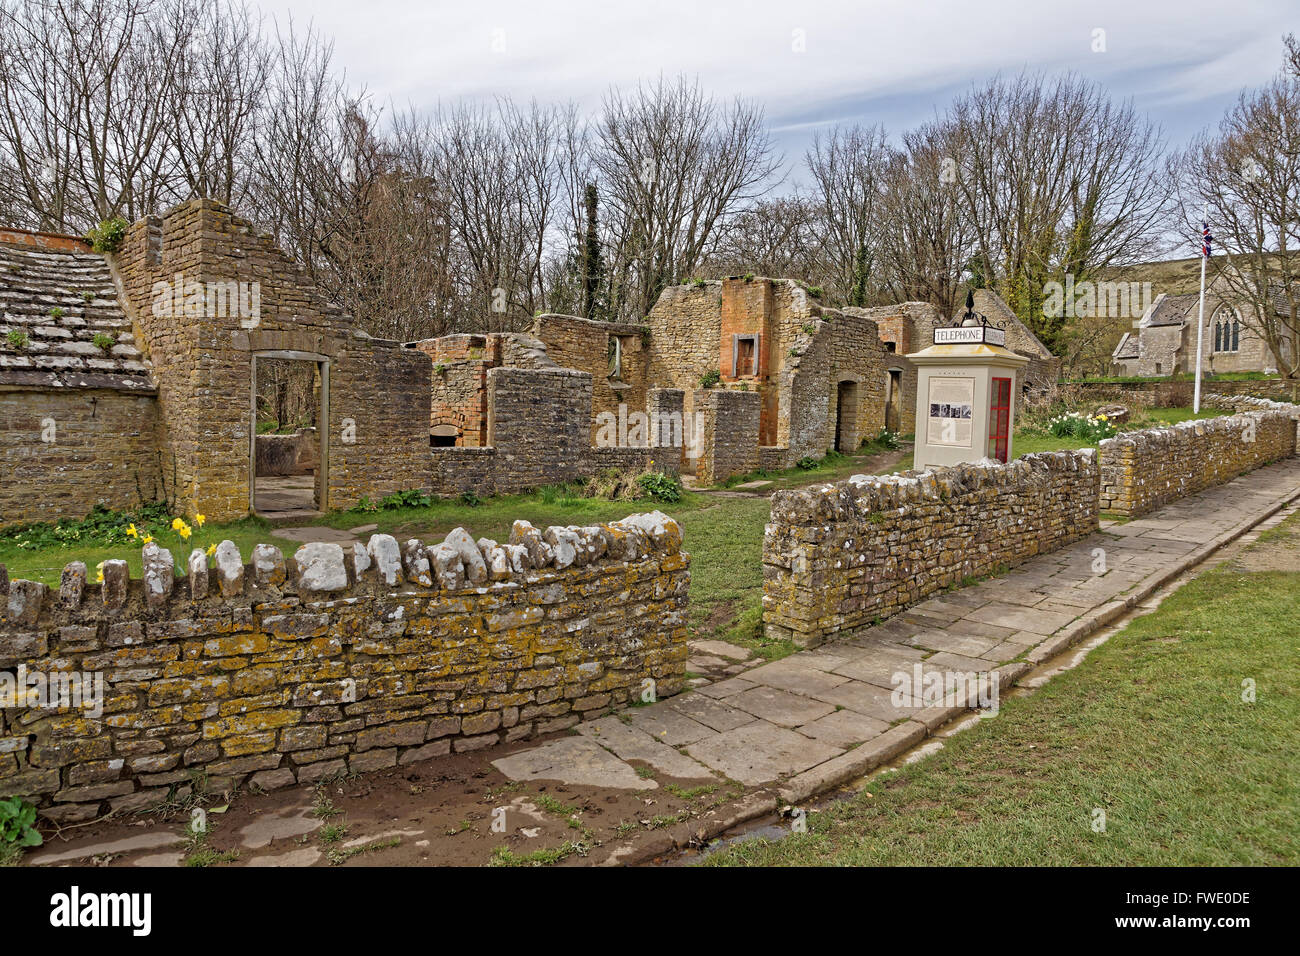 dilapidated houses in Tyneham village - Stock Image